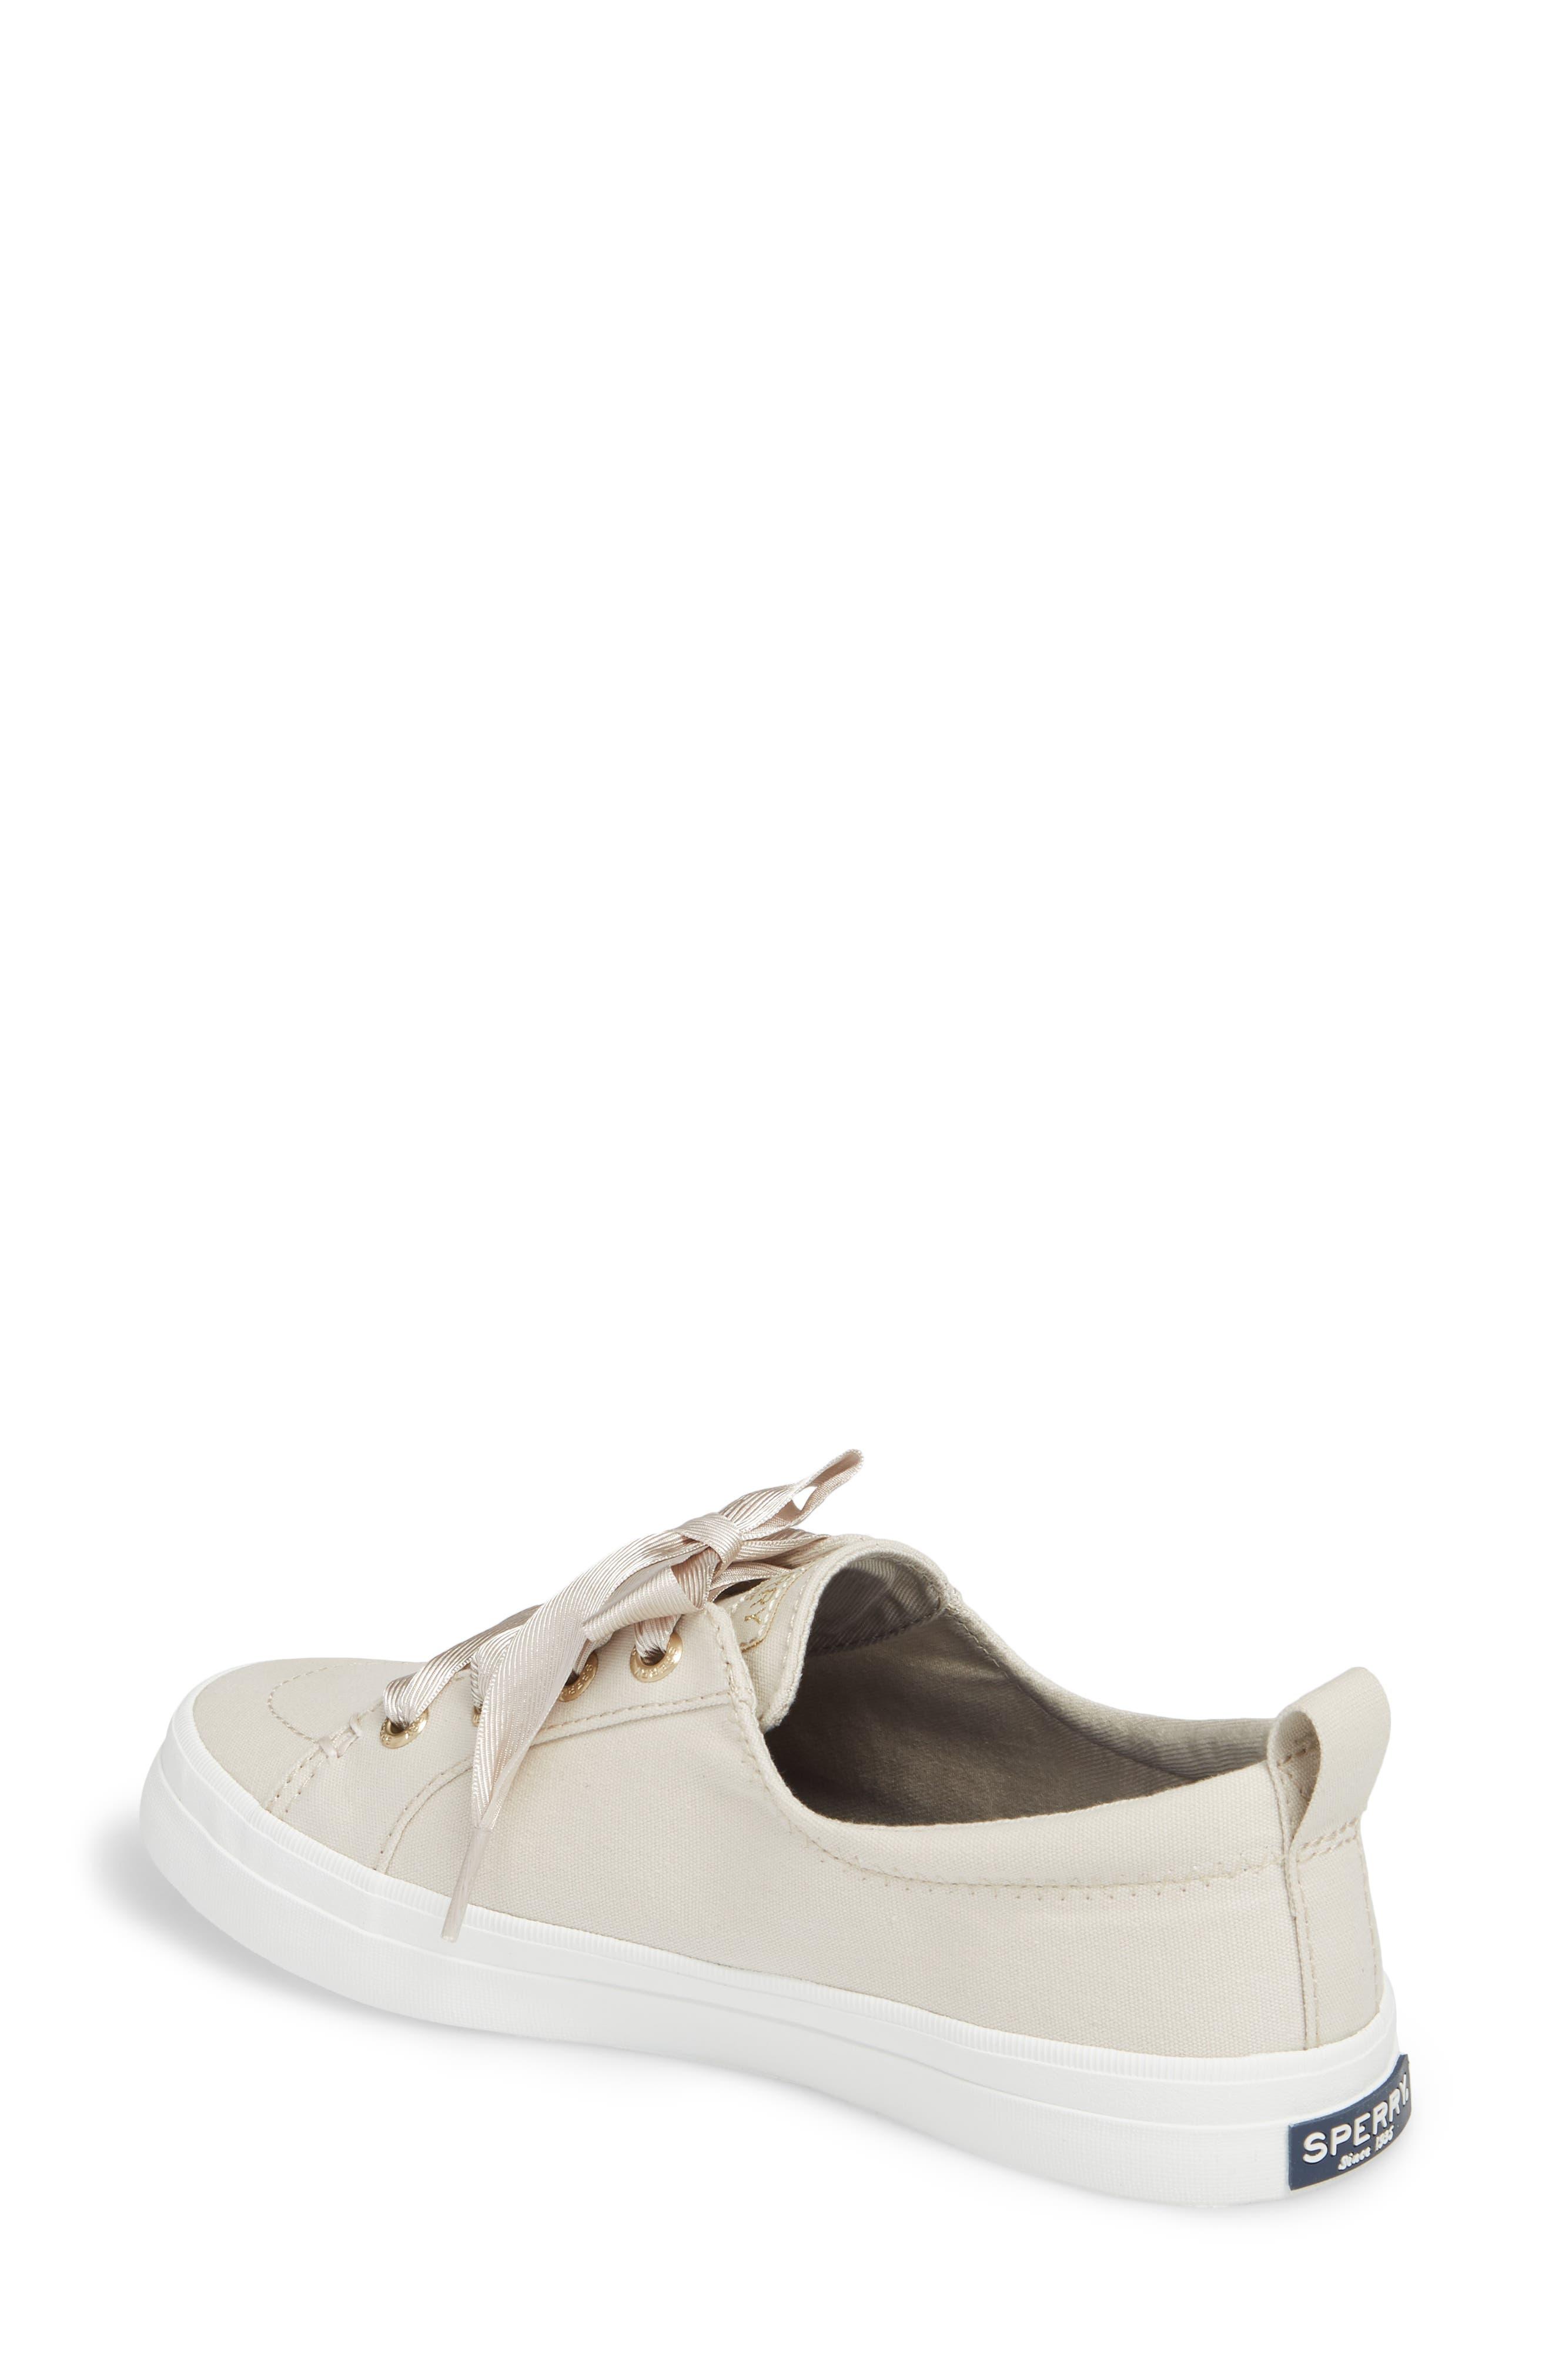 Crest Vibe Satin Lace Sneaker,                             Alternate thumbnail 5, color,